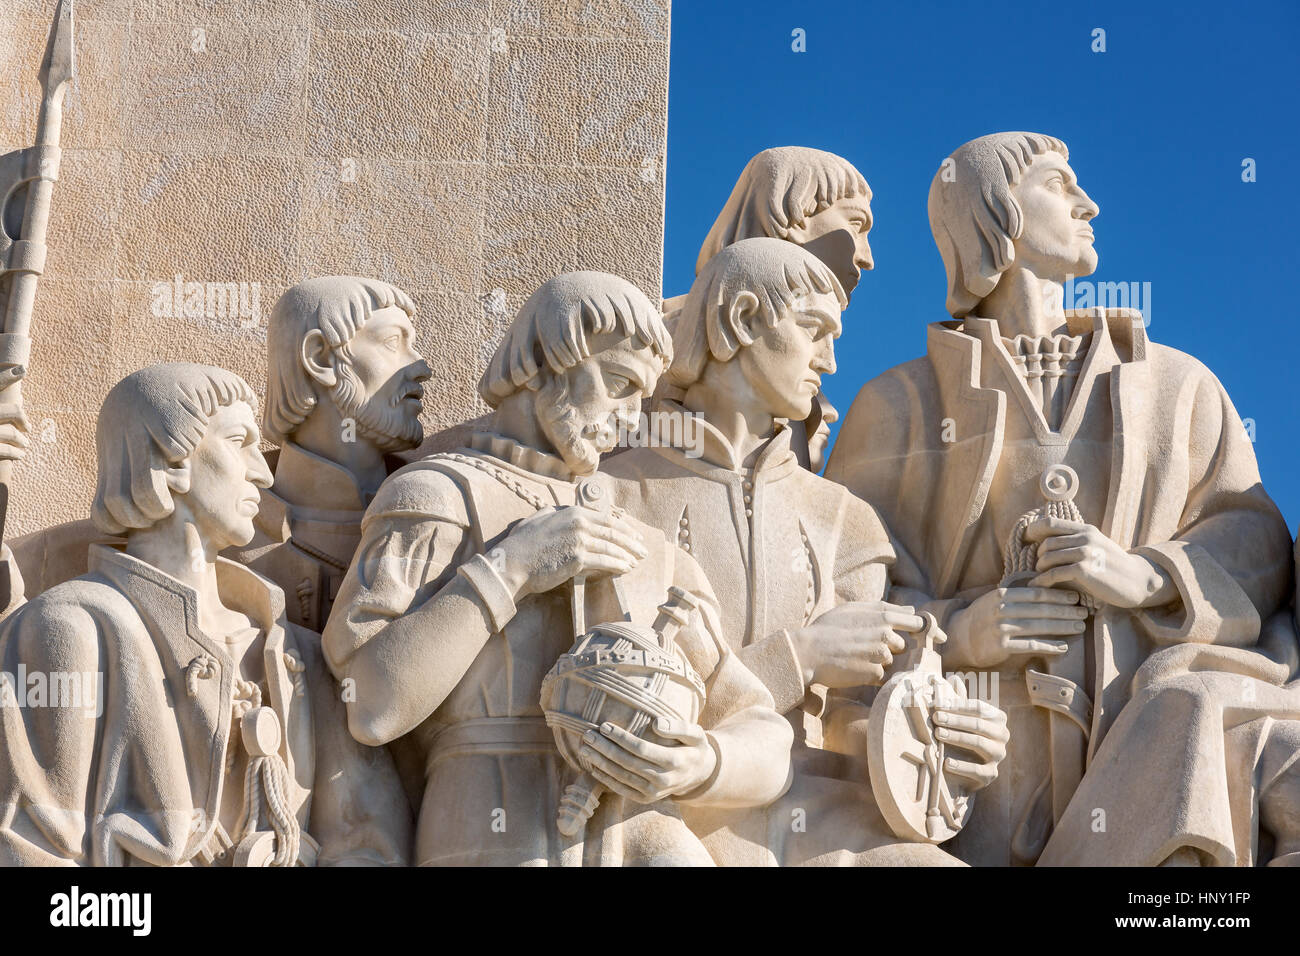 Monument to the Discoveries, Padrao dos Descobrimentos, Belem, Lisbon, Portugal - Stock Image